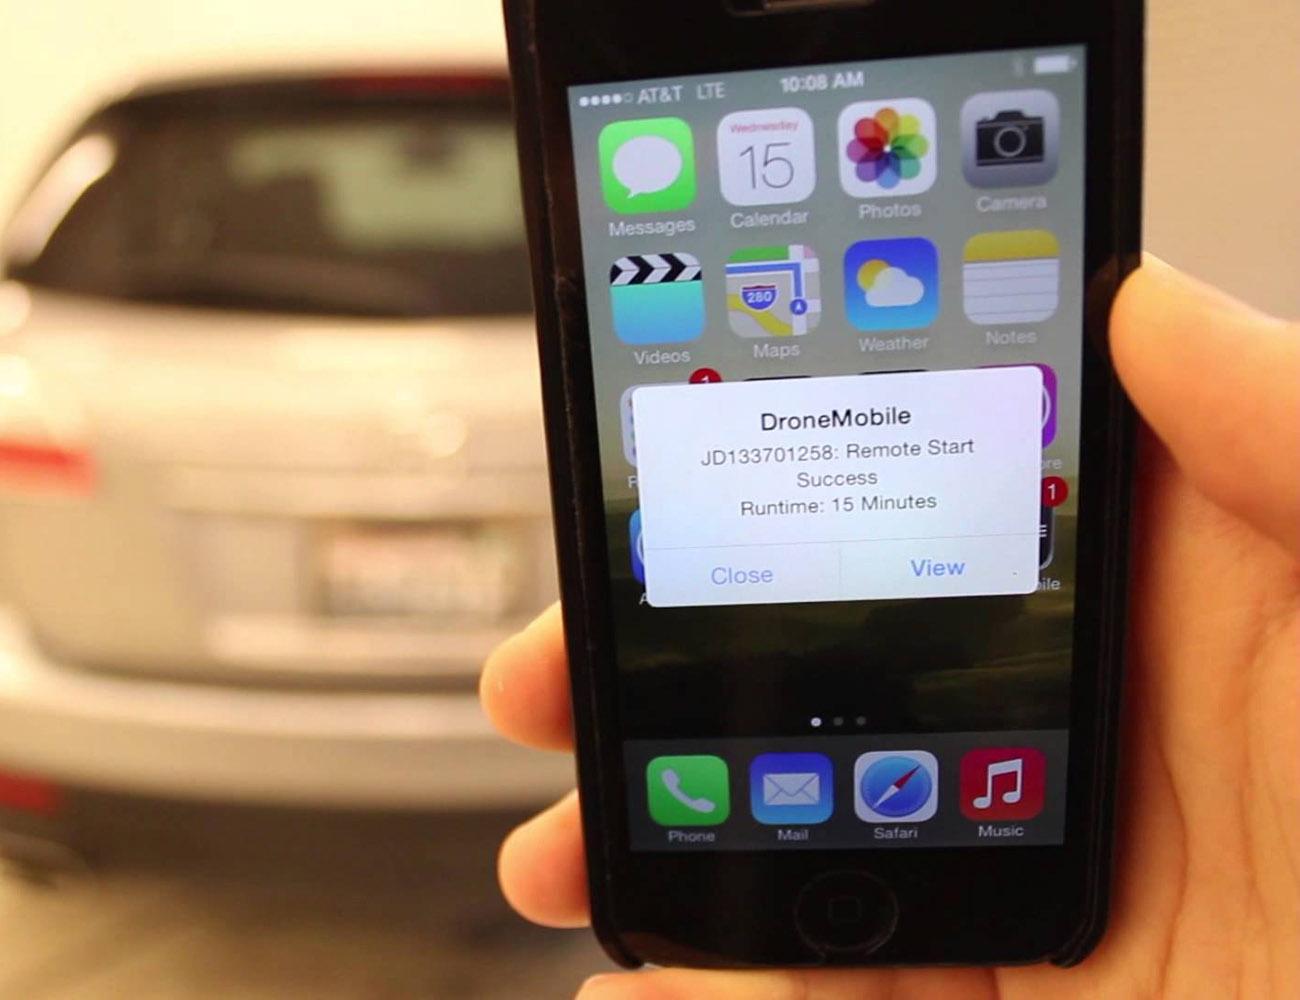 DroneMobile – Smartphone Remote Start GPS System